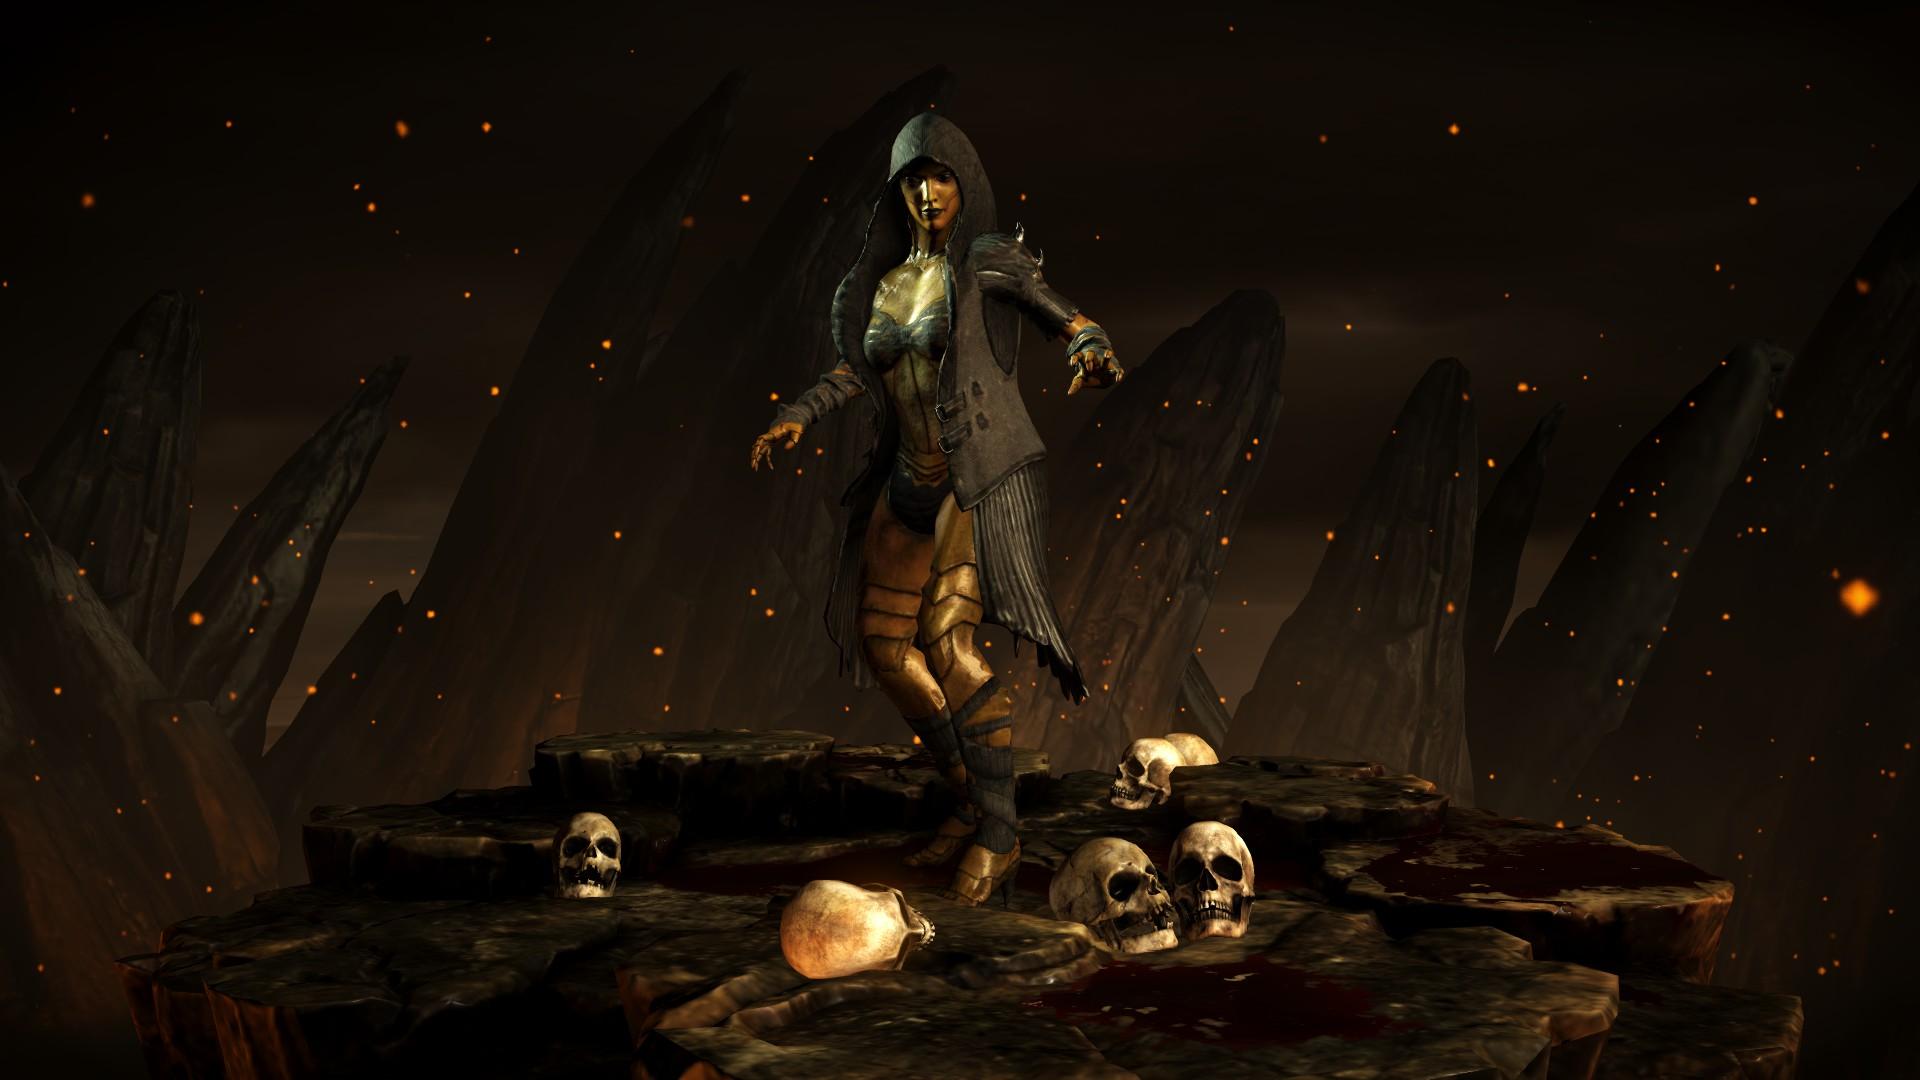 Ди'Вора (Костюм: Королева кайтиннов) - Mortal Kombat X Ди'Вора